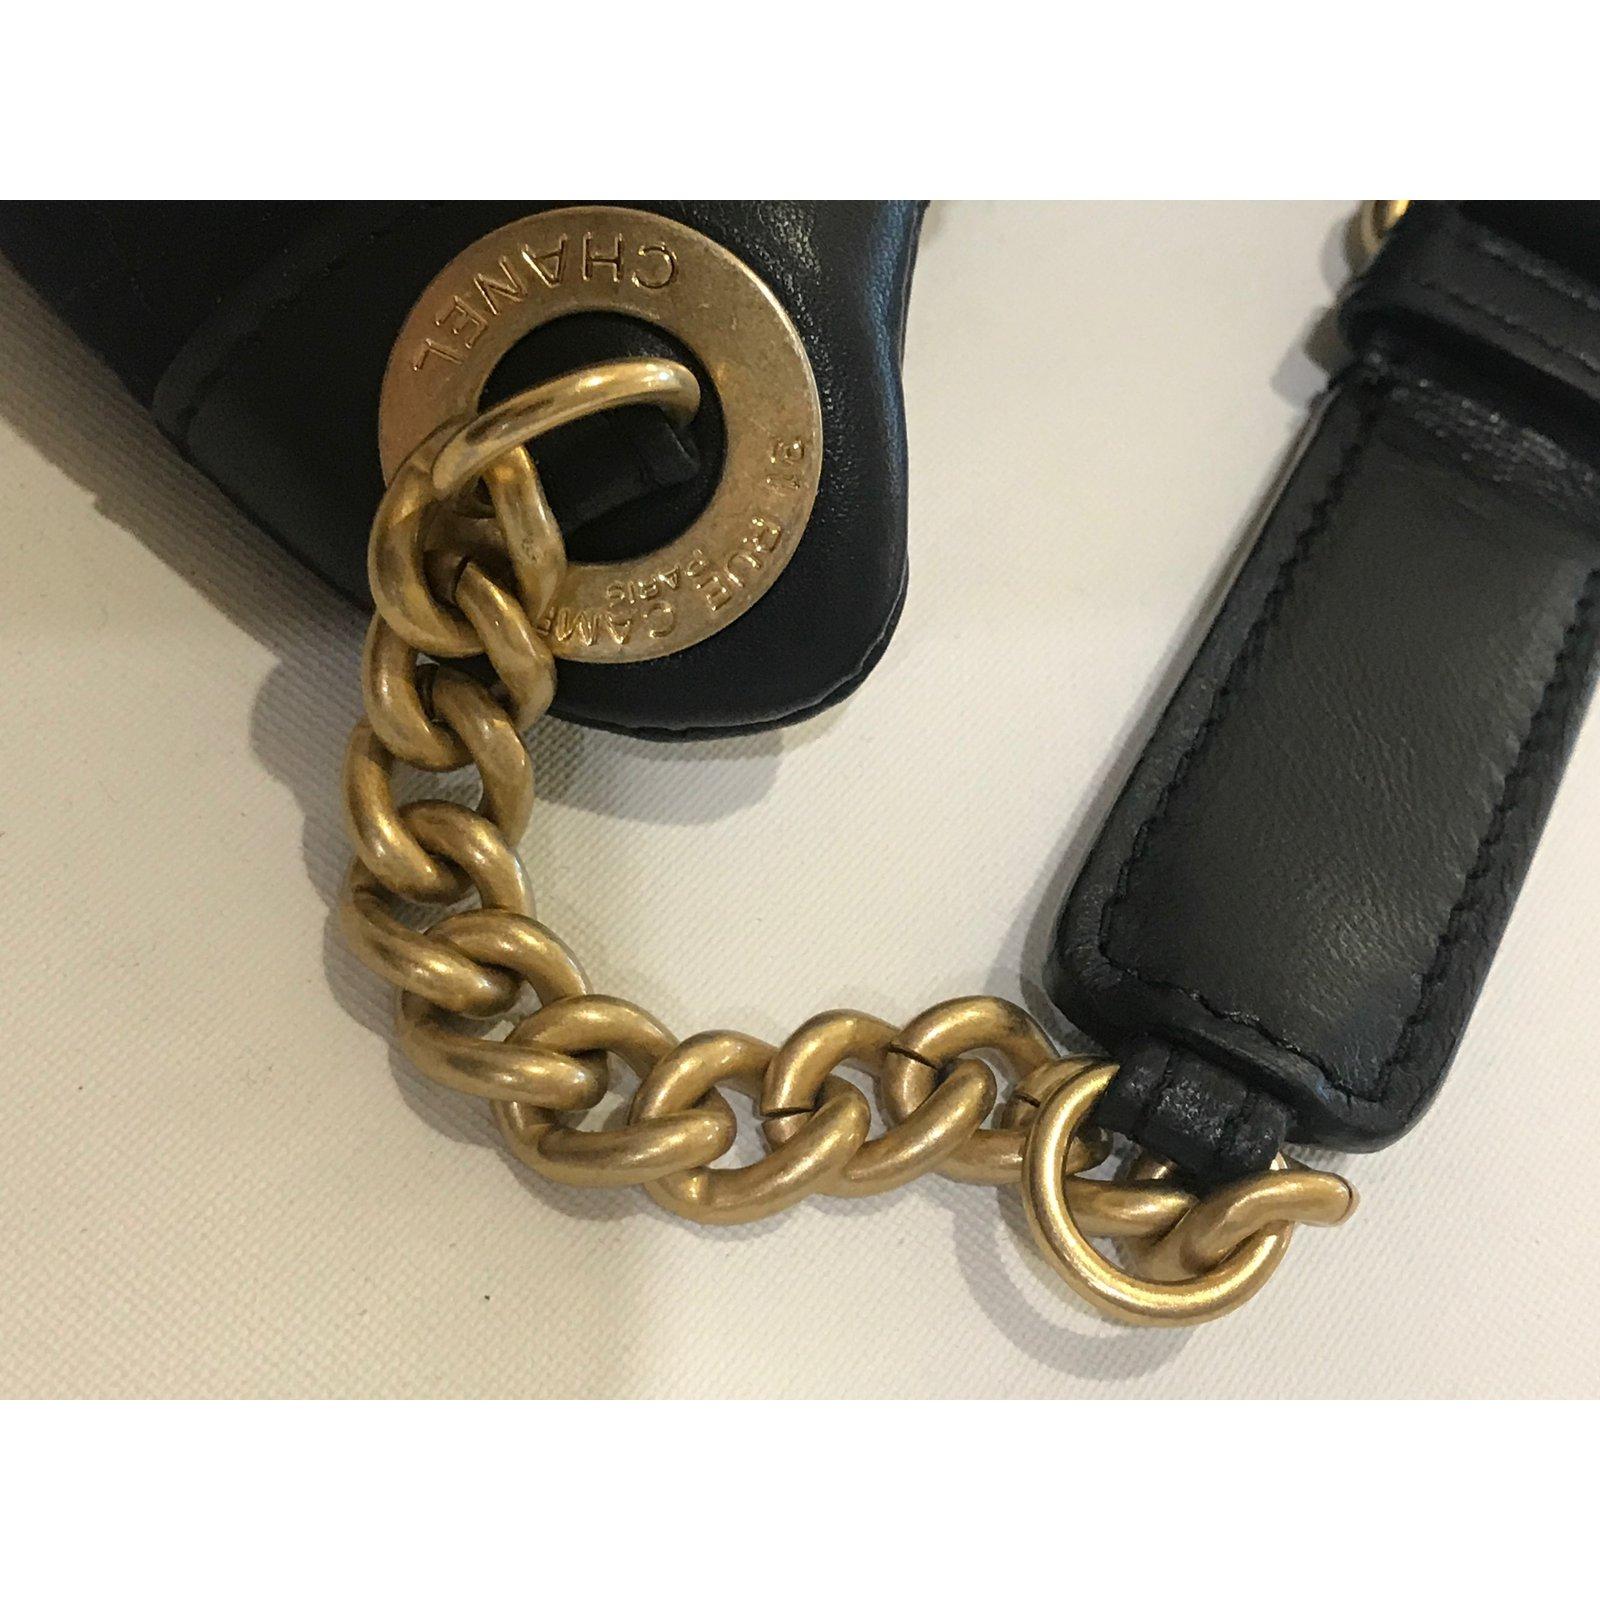 1b42cbaa7df2b Chanel CHANEL Belt 2018 Bag Handbags Wool Navy blue ref.74157 - Joli Closet